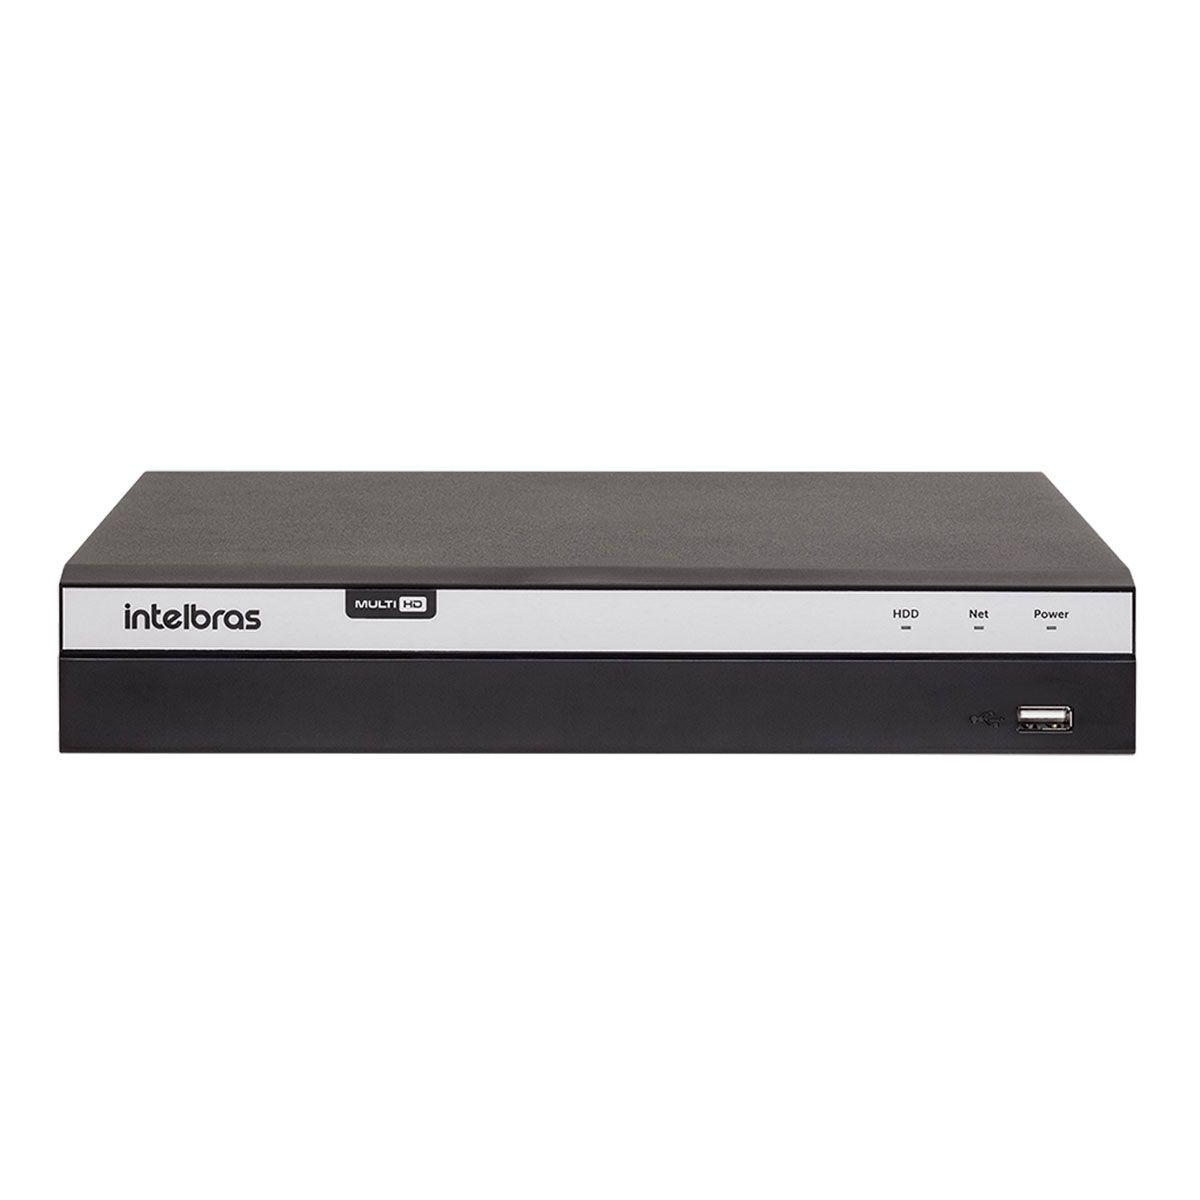 DVR Intelbras 08 Canais Full HD MHDX 3108 1080p Multi HD + 4 Canais IP 5 Mp  - Tudo Forte